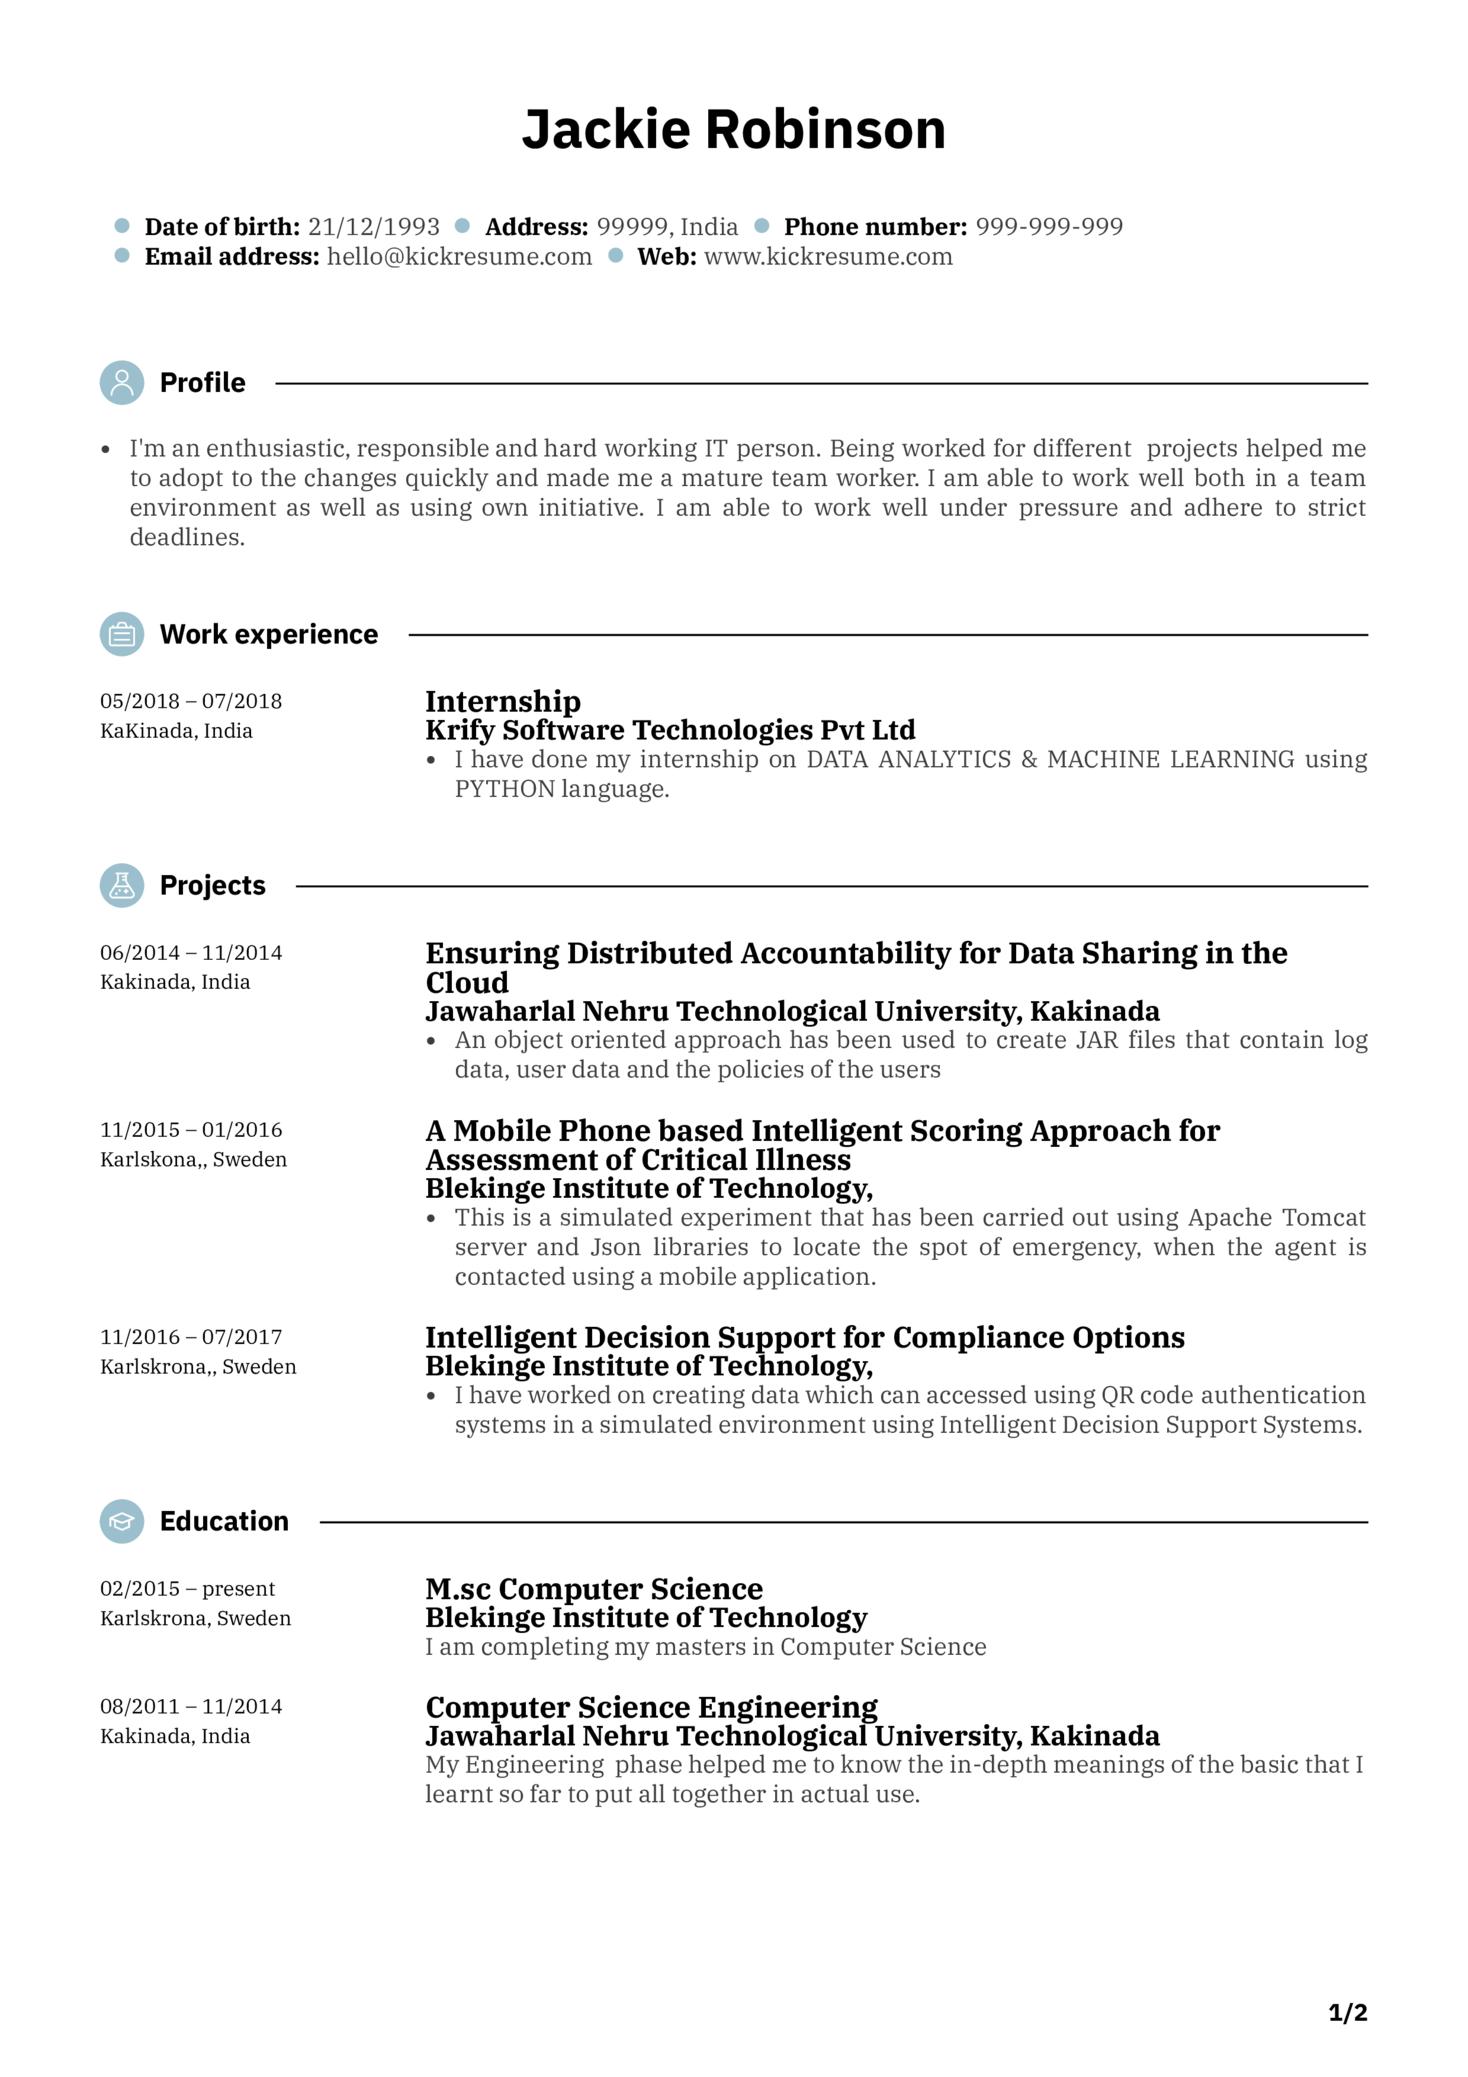 Junior Software Engineer Resume Sample (parte 1)